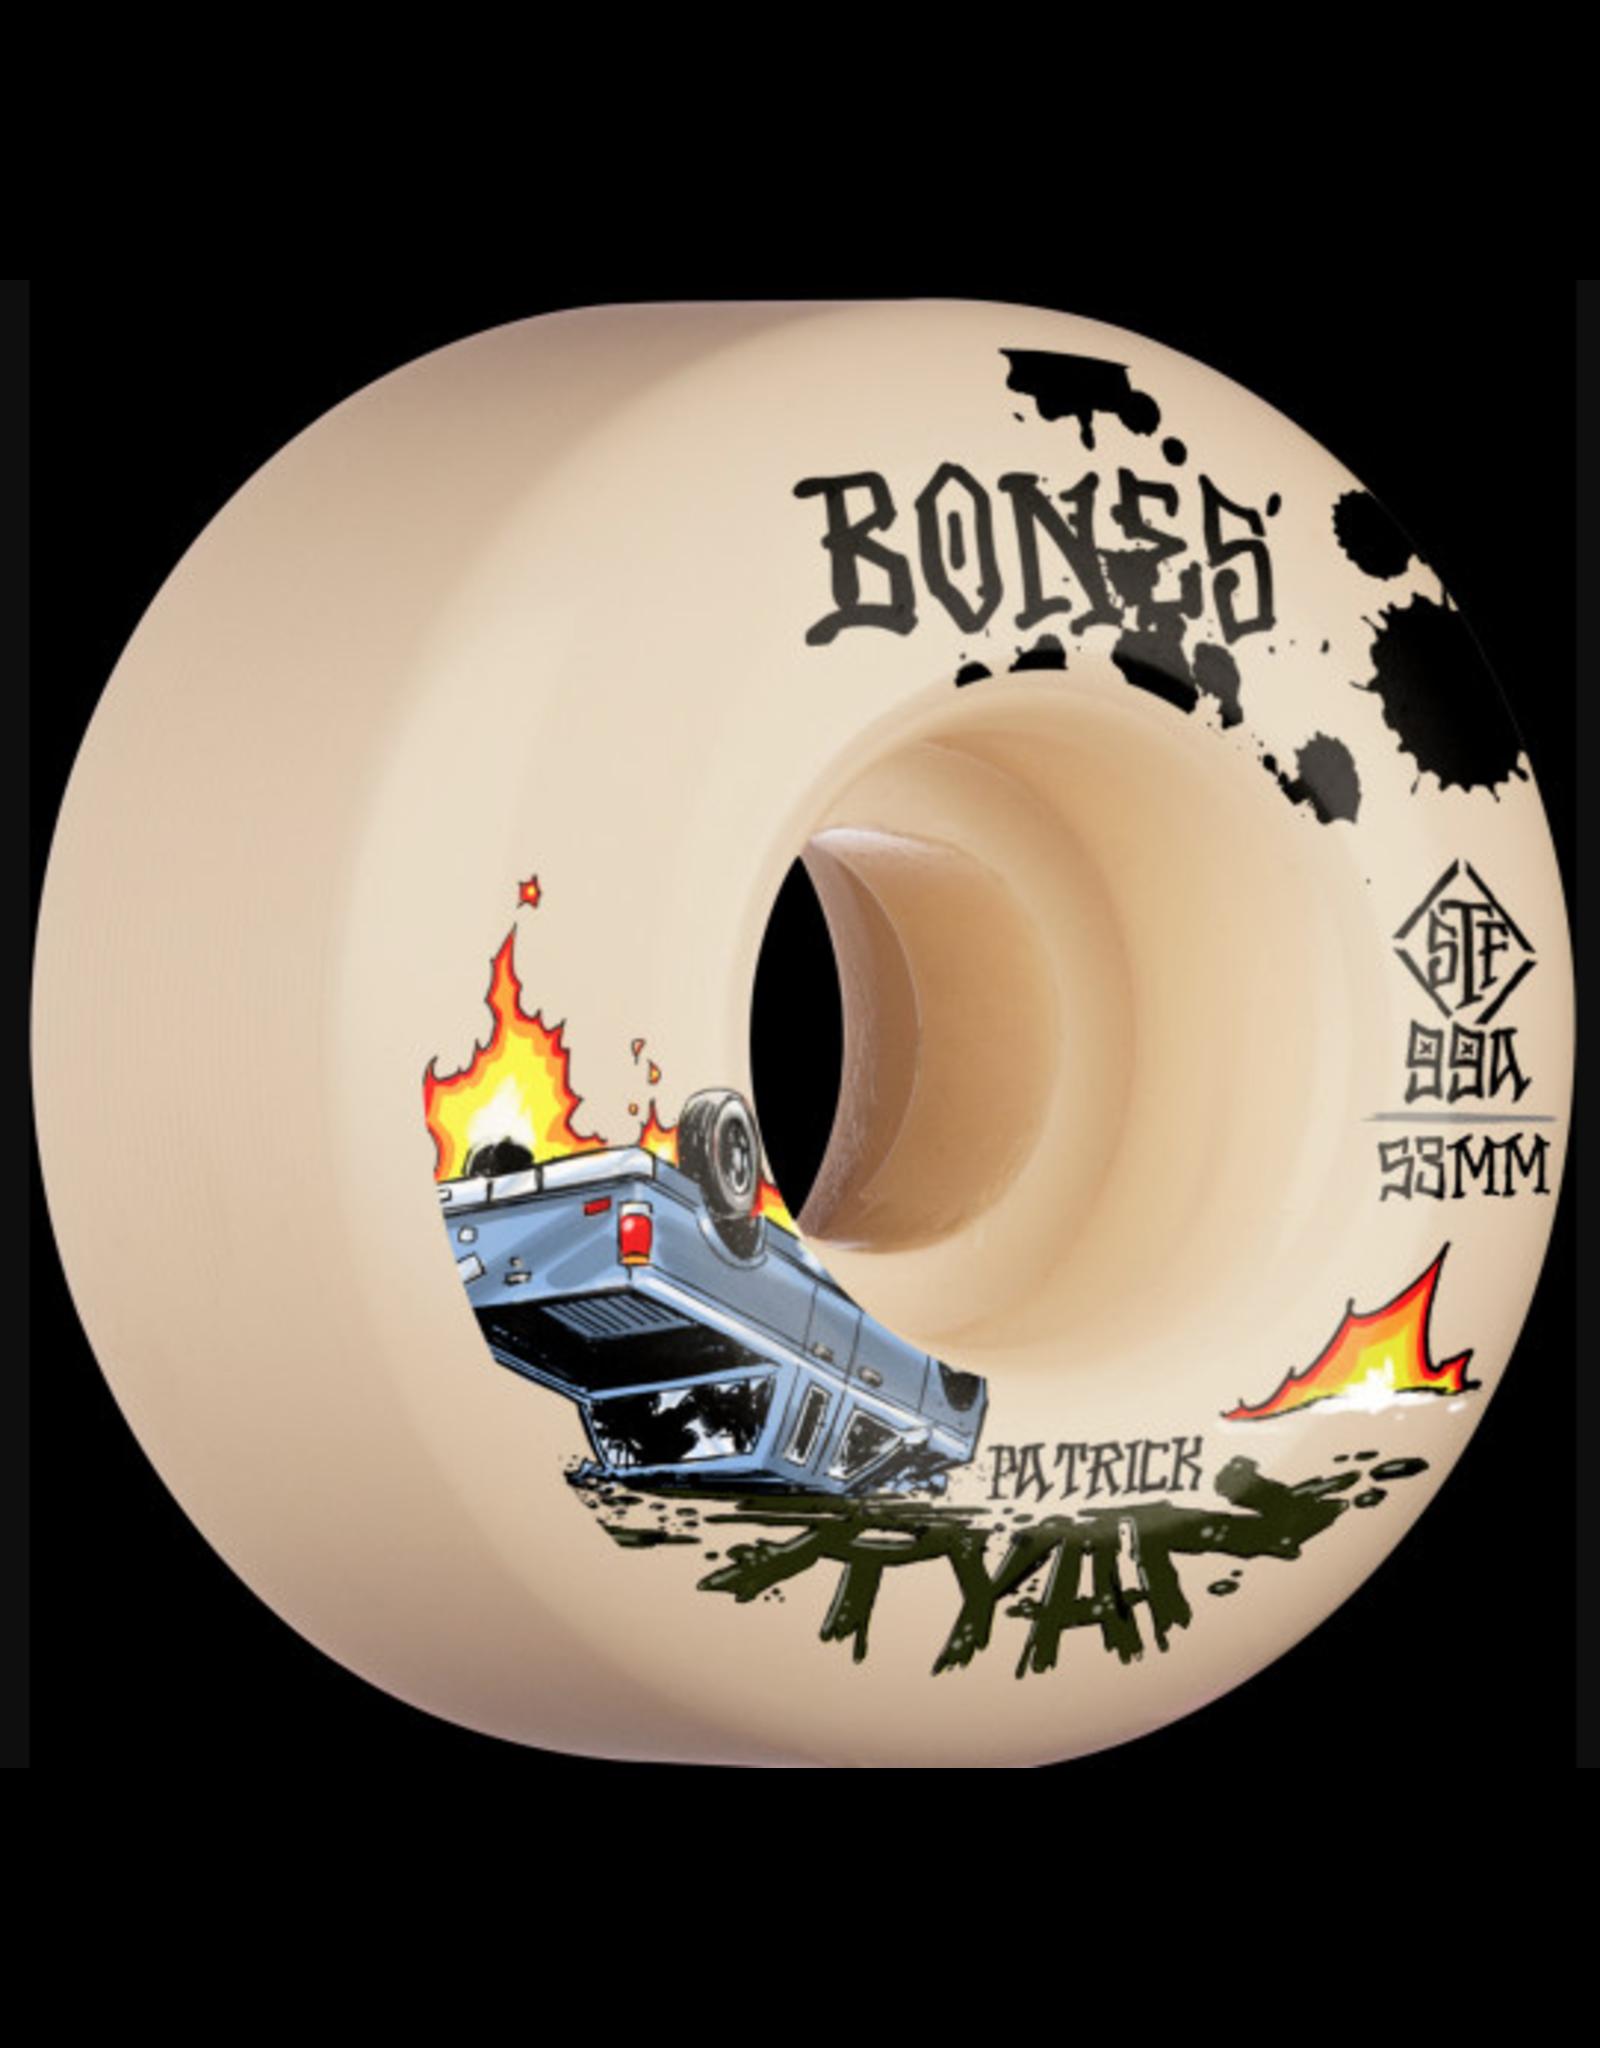 BONES BONES PRO SERIES 99A STREET TECH FORMULA, RYAN CRASH AND BURN 53MM V4 WIDE (SET OF 4 WHEELS)